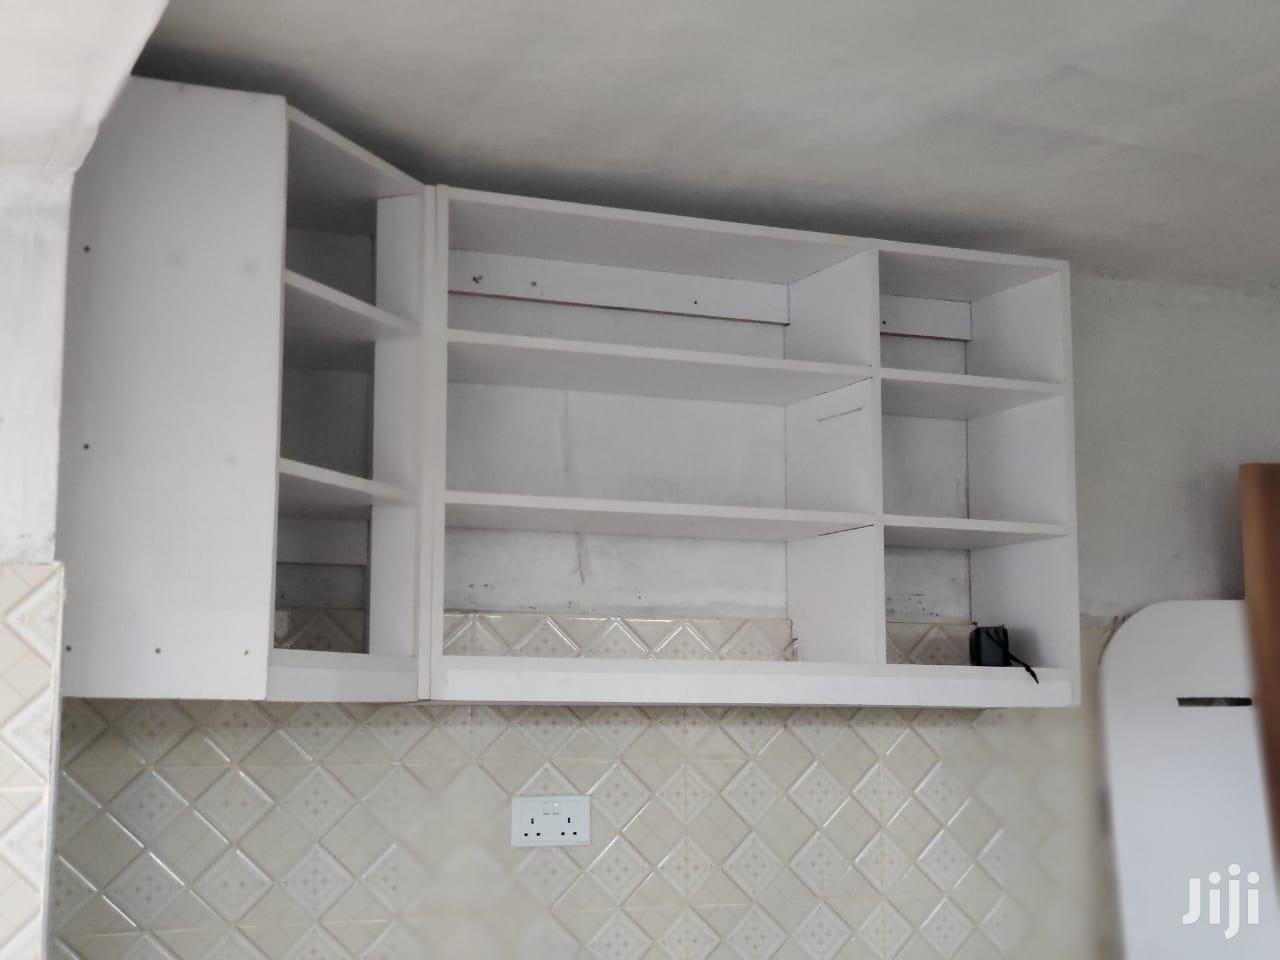 4 Bedroom House For Sale In Matangi Ruiru. | Houses & Apartments For Sale for sale in Ruiru, Kiambu, Kenya